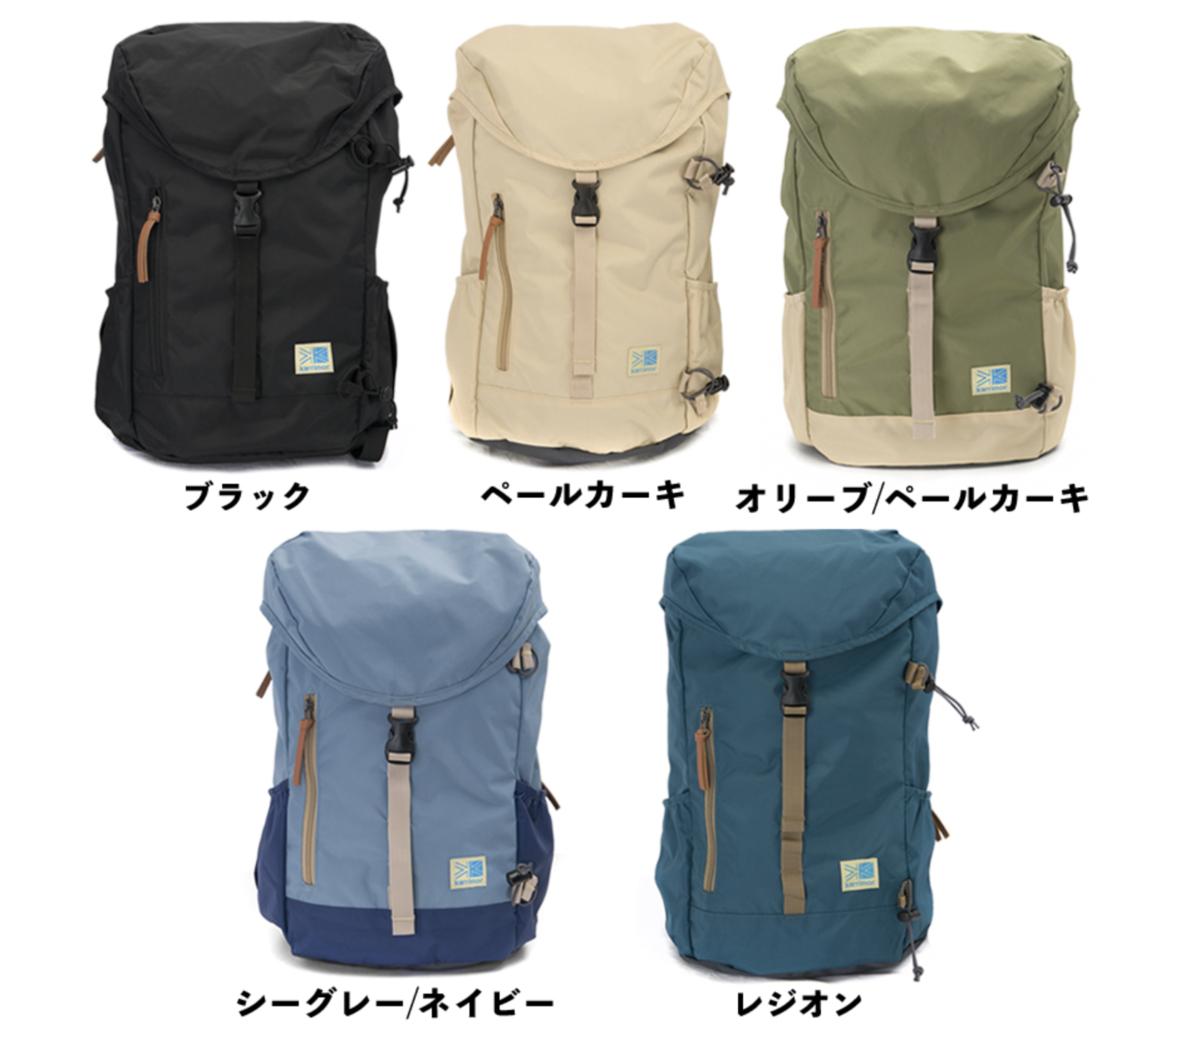 f:id:thebackpack:20190829190004p:plain